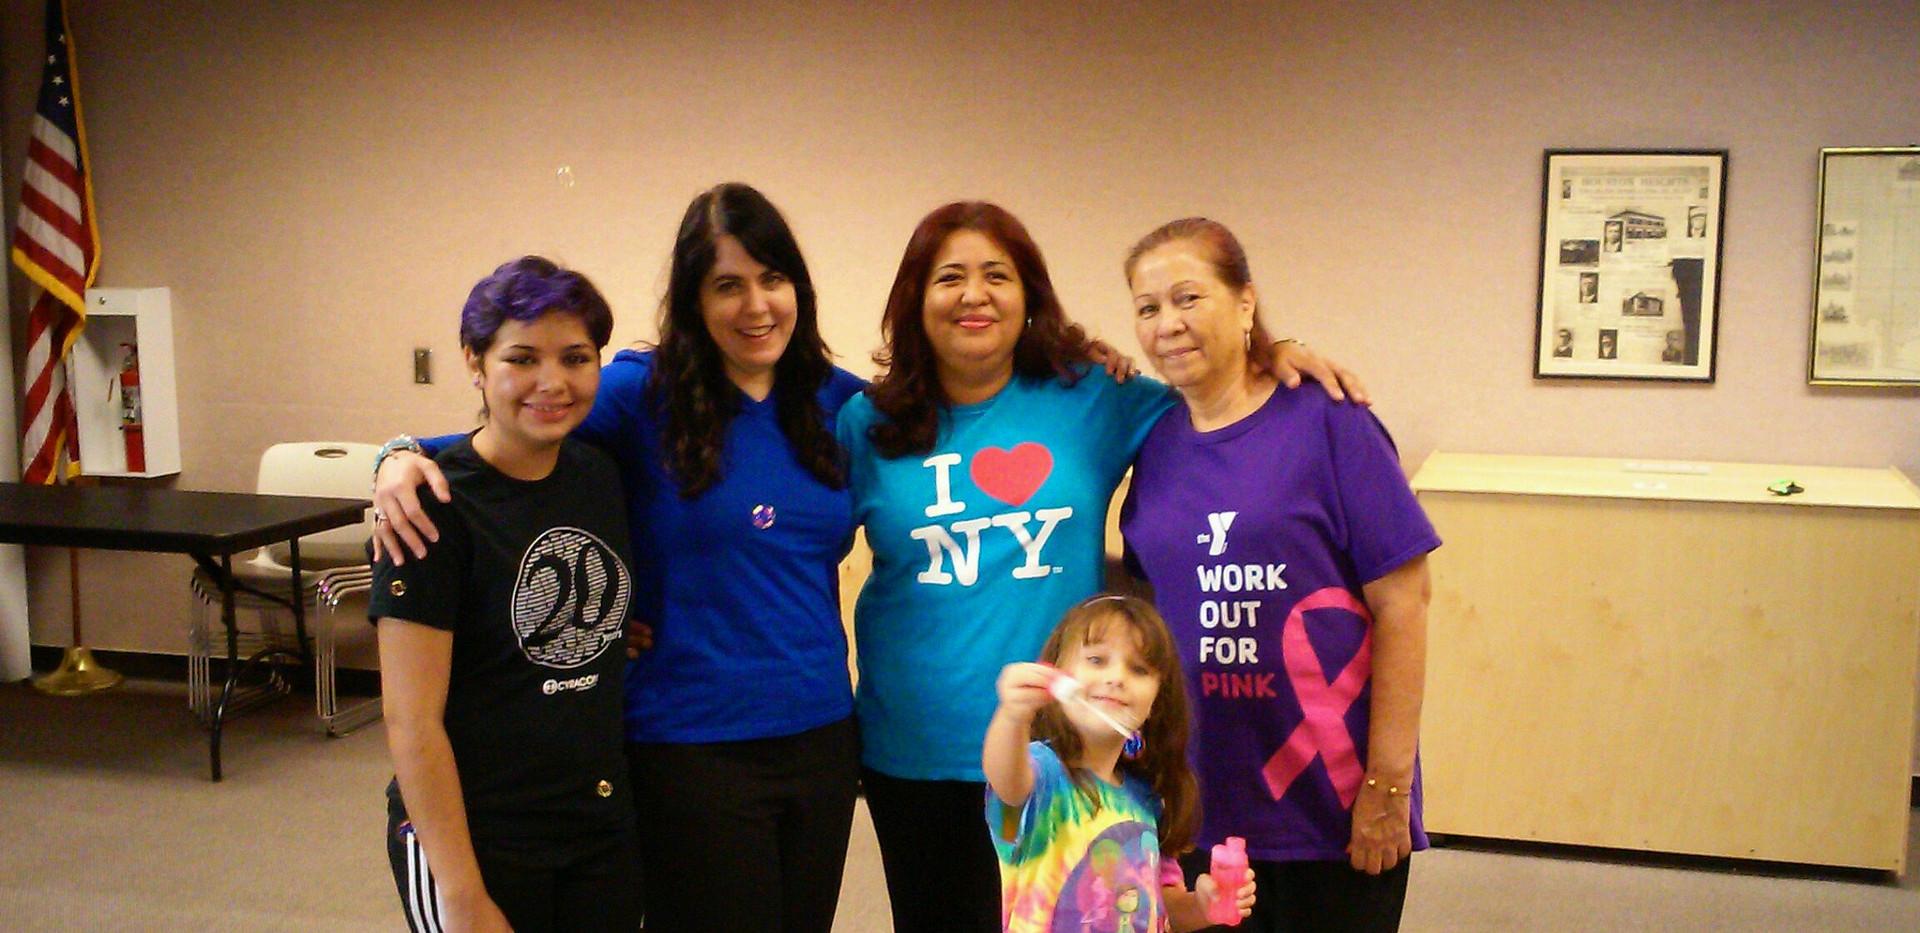 Houston Laughter Yoga groups